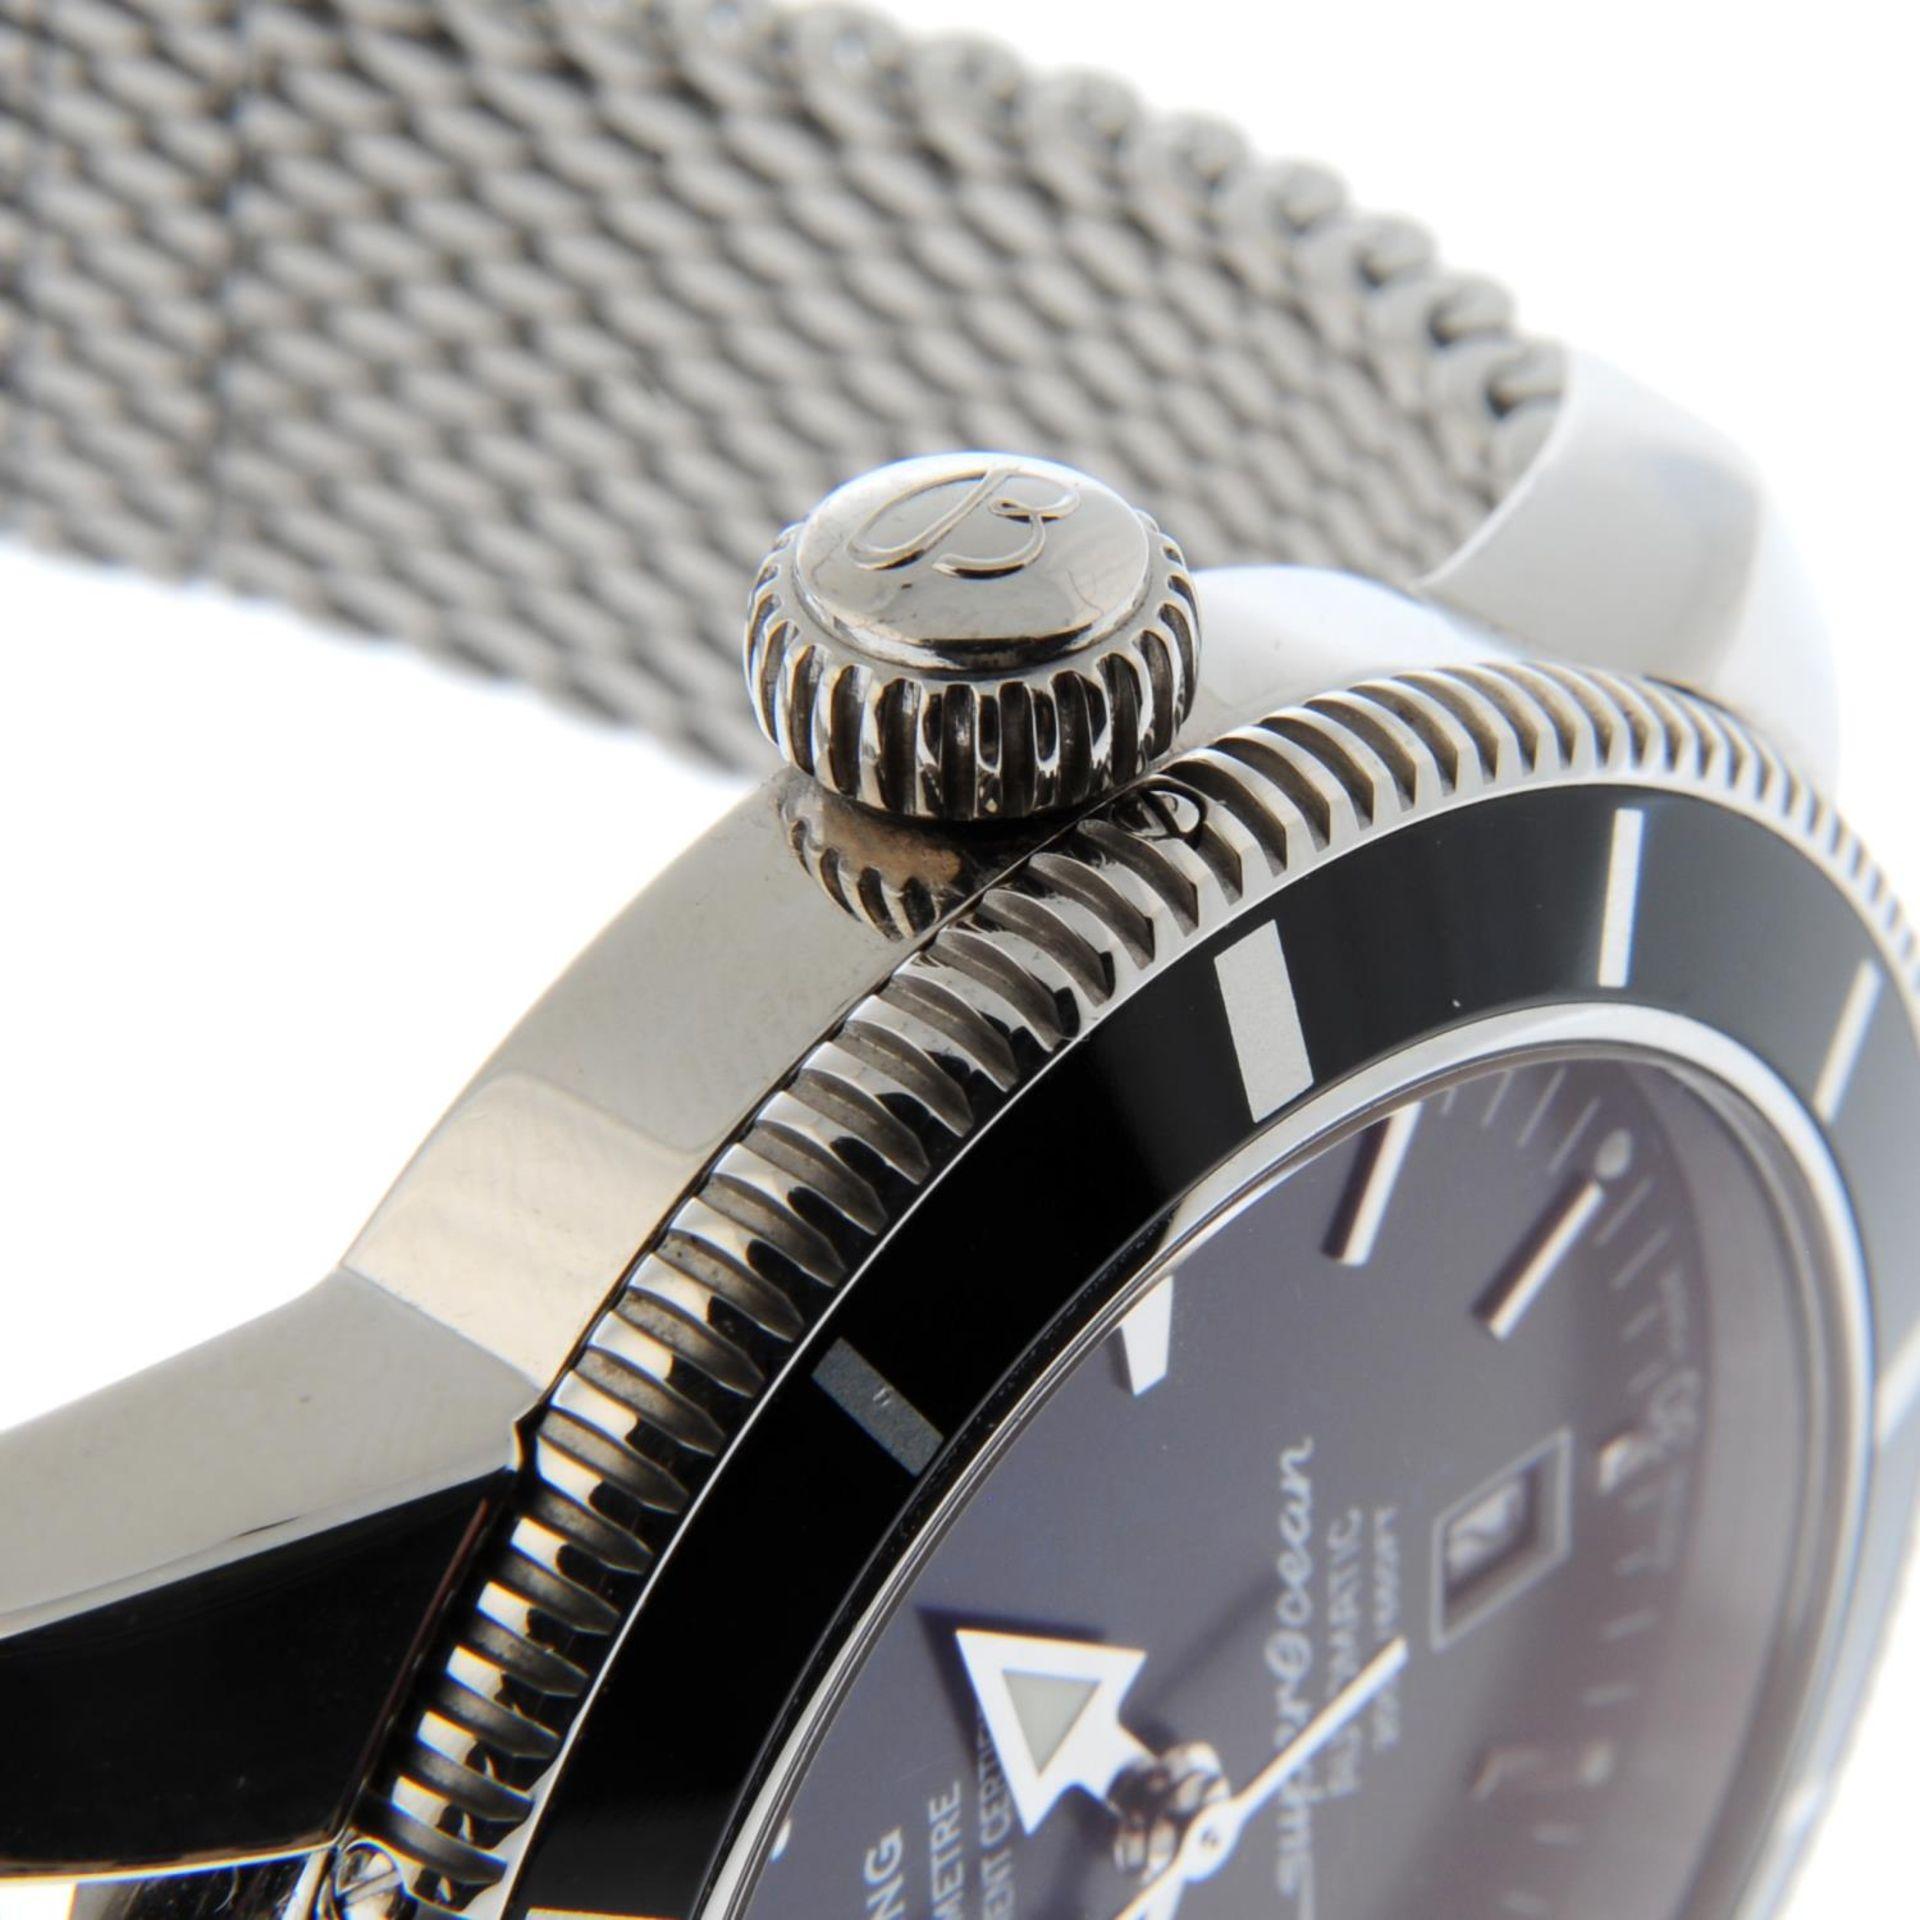 BREITLING - a SuperOcean Heritage 46 bracelet watch. - Bild 5 aus 6